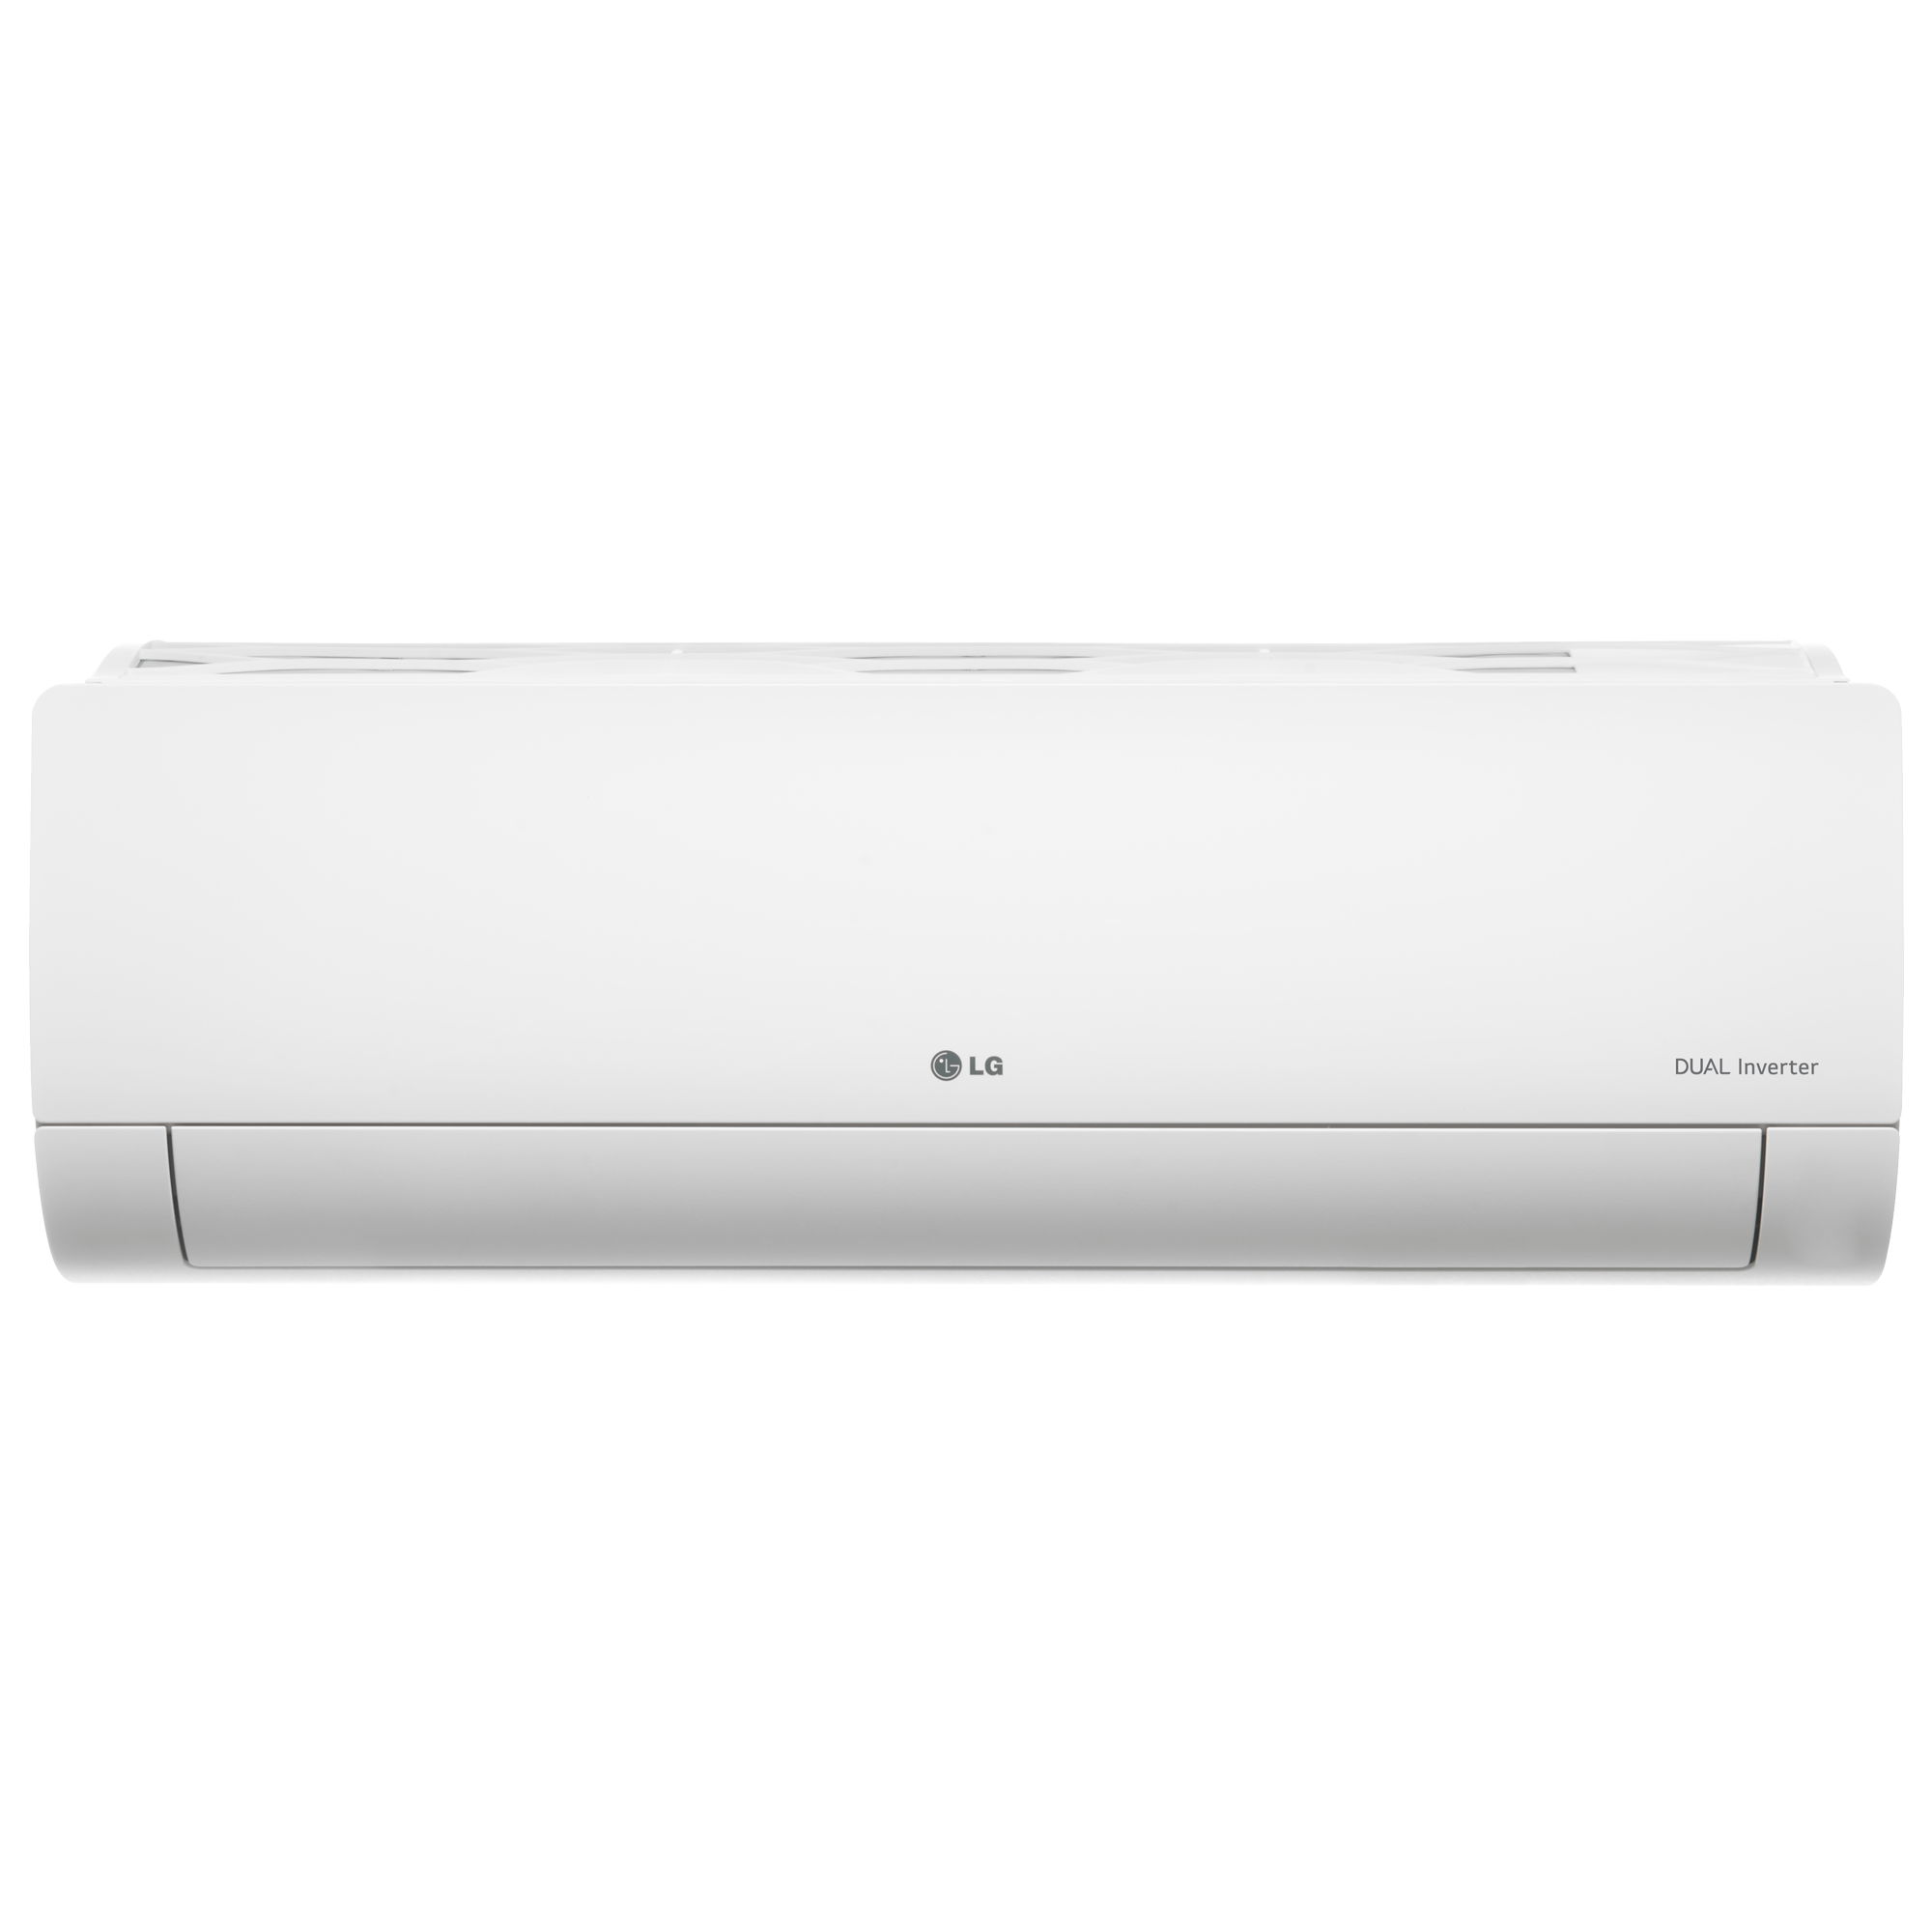 LG 1.5 Ton 5 Star Inverter Split AC (Air Purification Filter, Copper Condenser, MS-Q18ANZA, White)_1